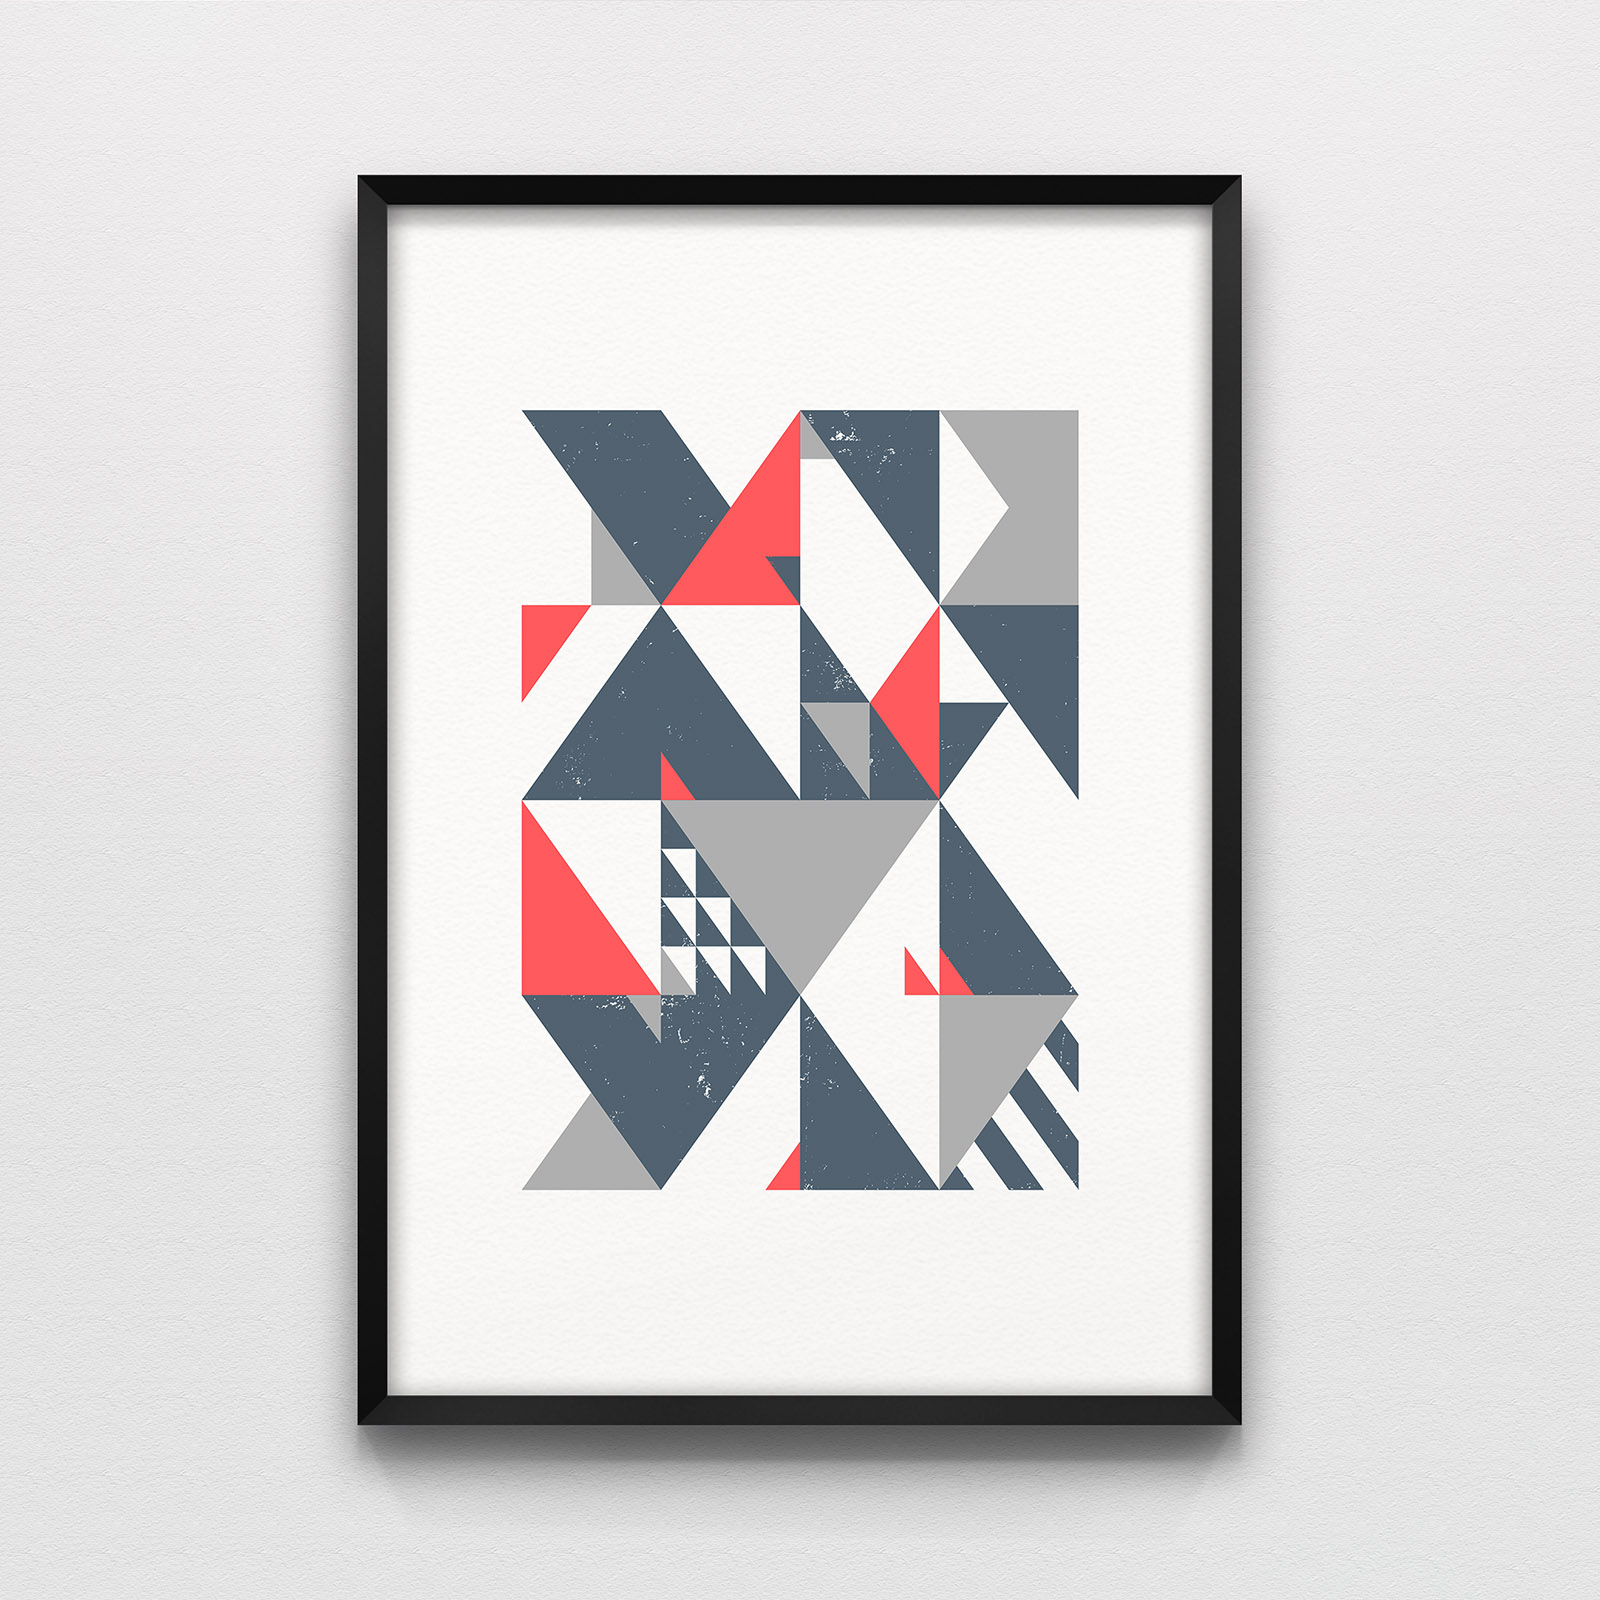 Algebra #2 (50 x 35 cm)